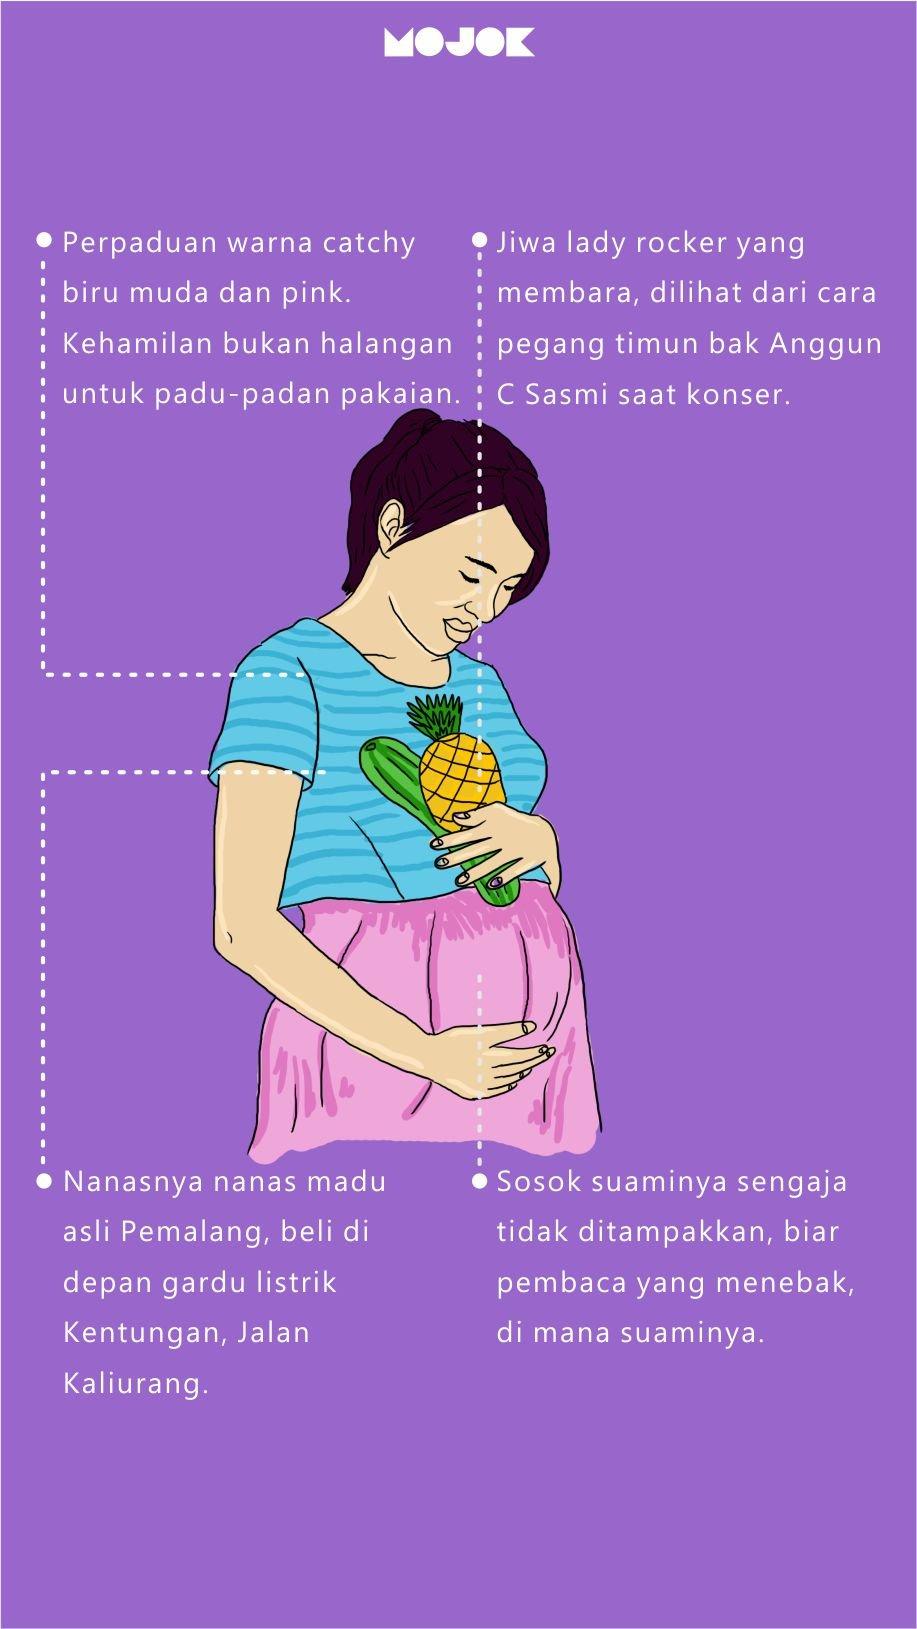 420 Gambar Kata Kata Ibu Hamil Terbaru